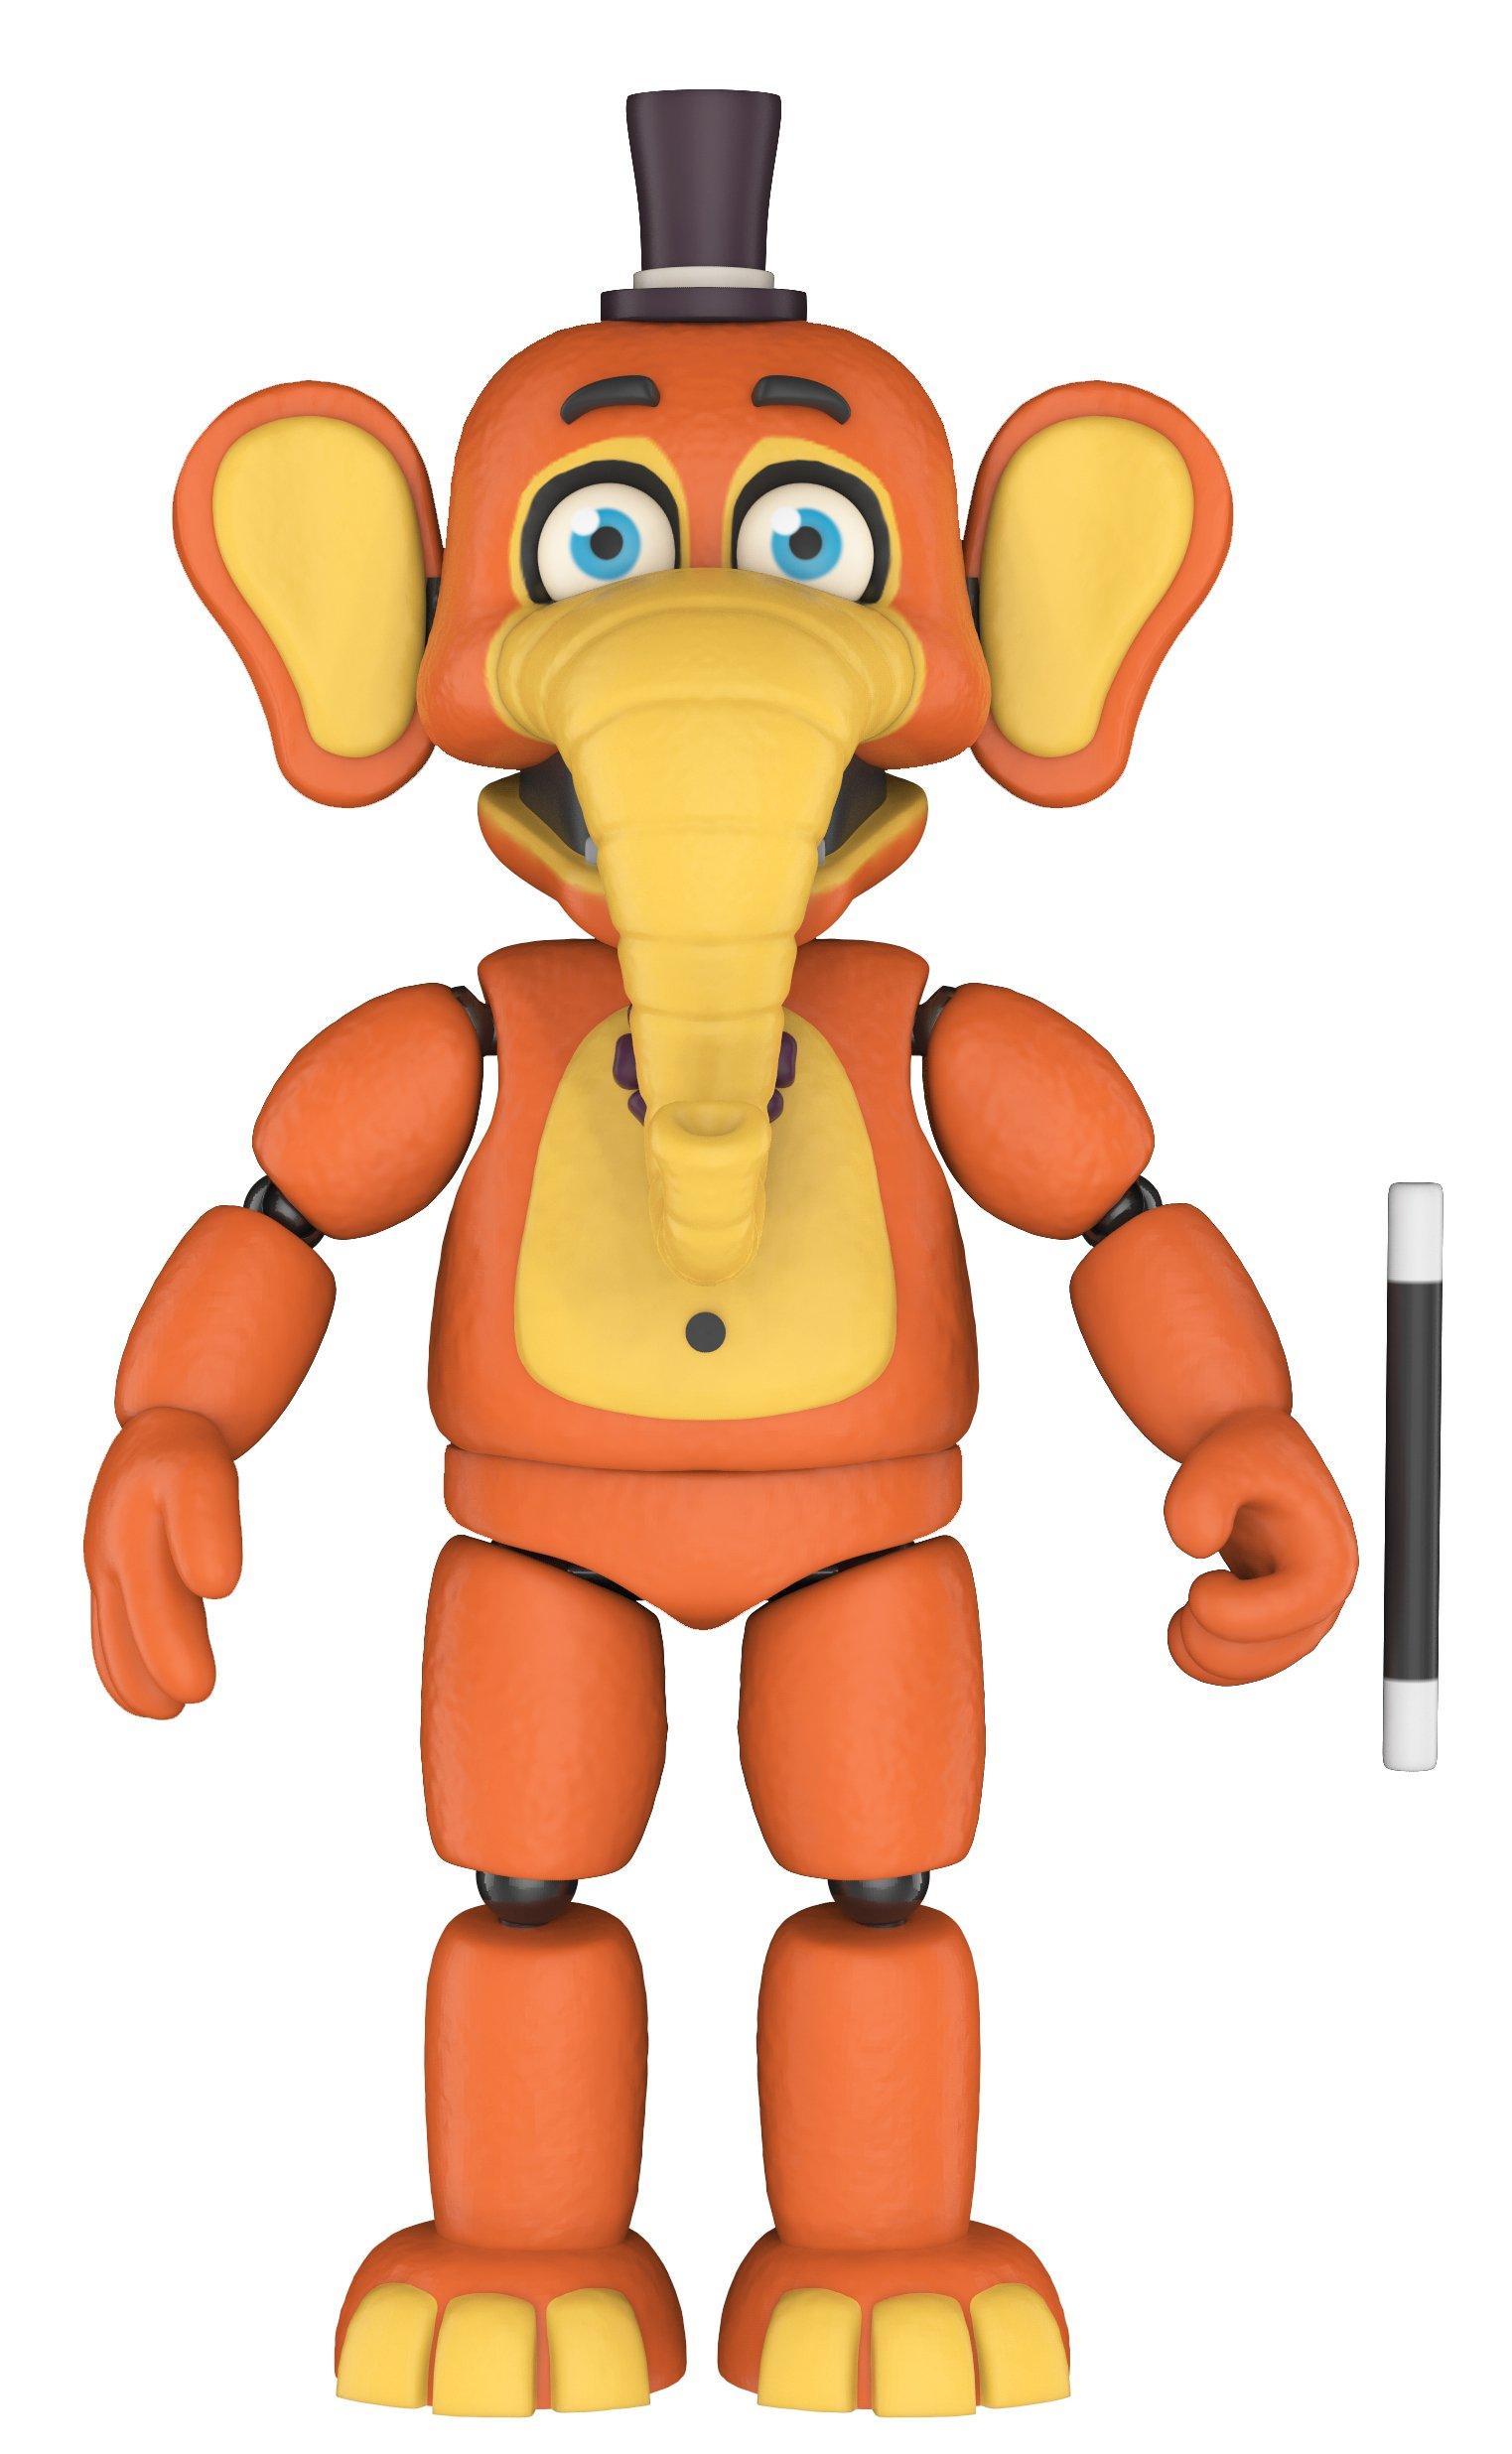 Funko Five Nights at Freddy's Pizza Simulator - Orville Elephant Collectible Figure, Multicolor